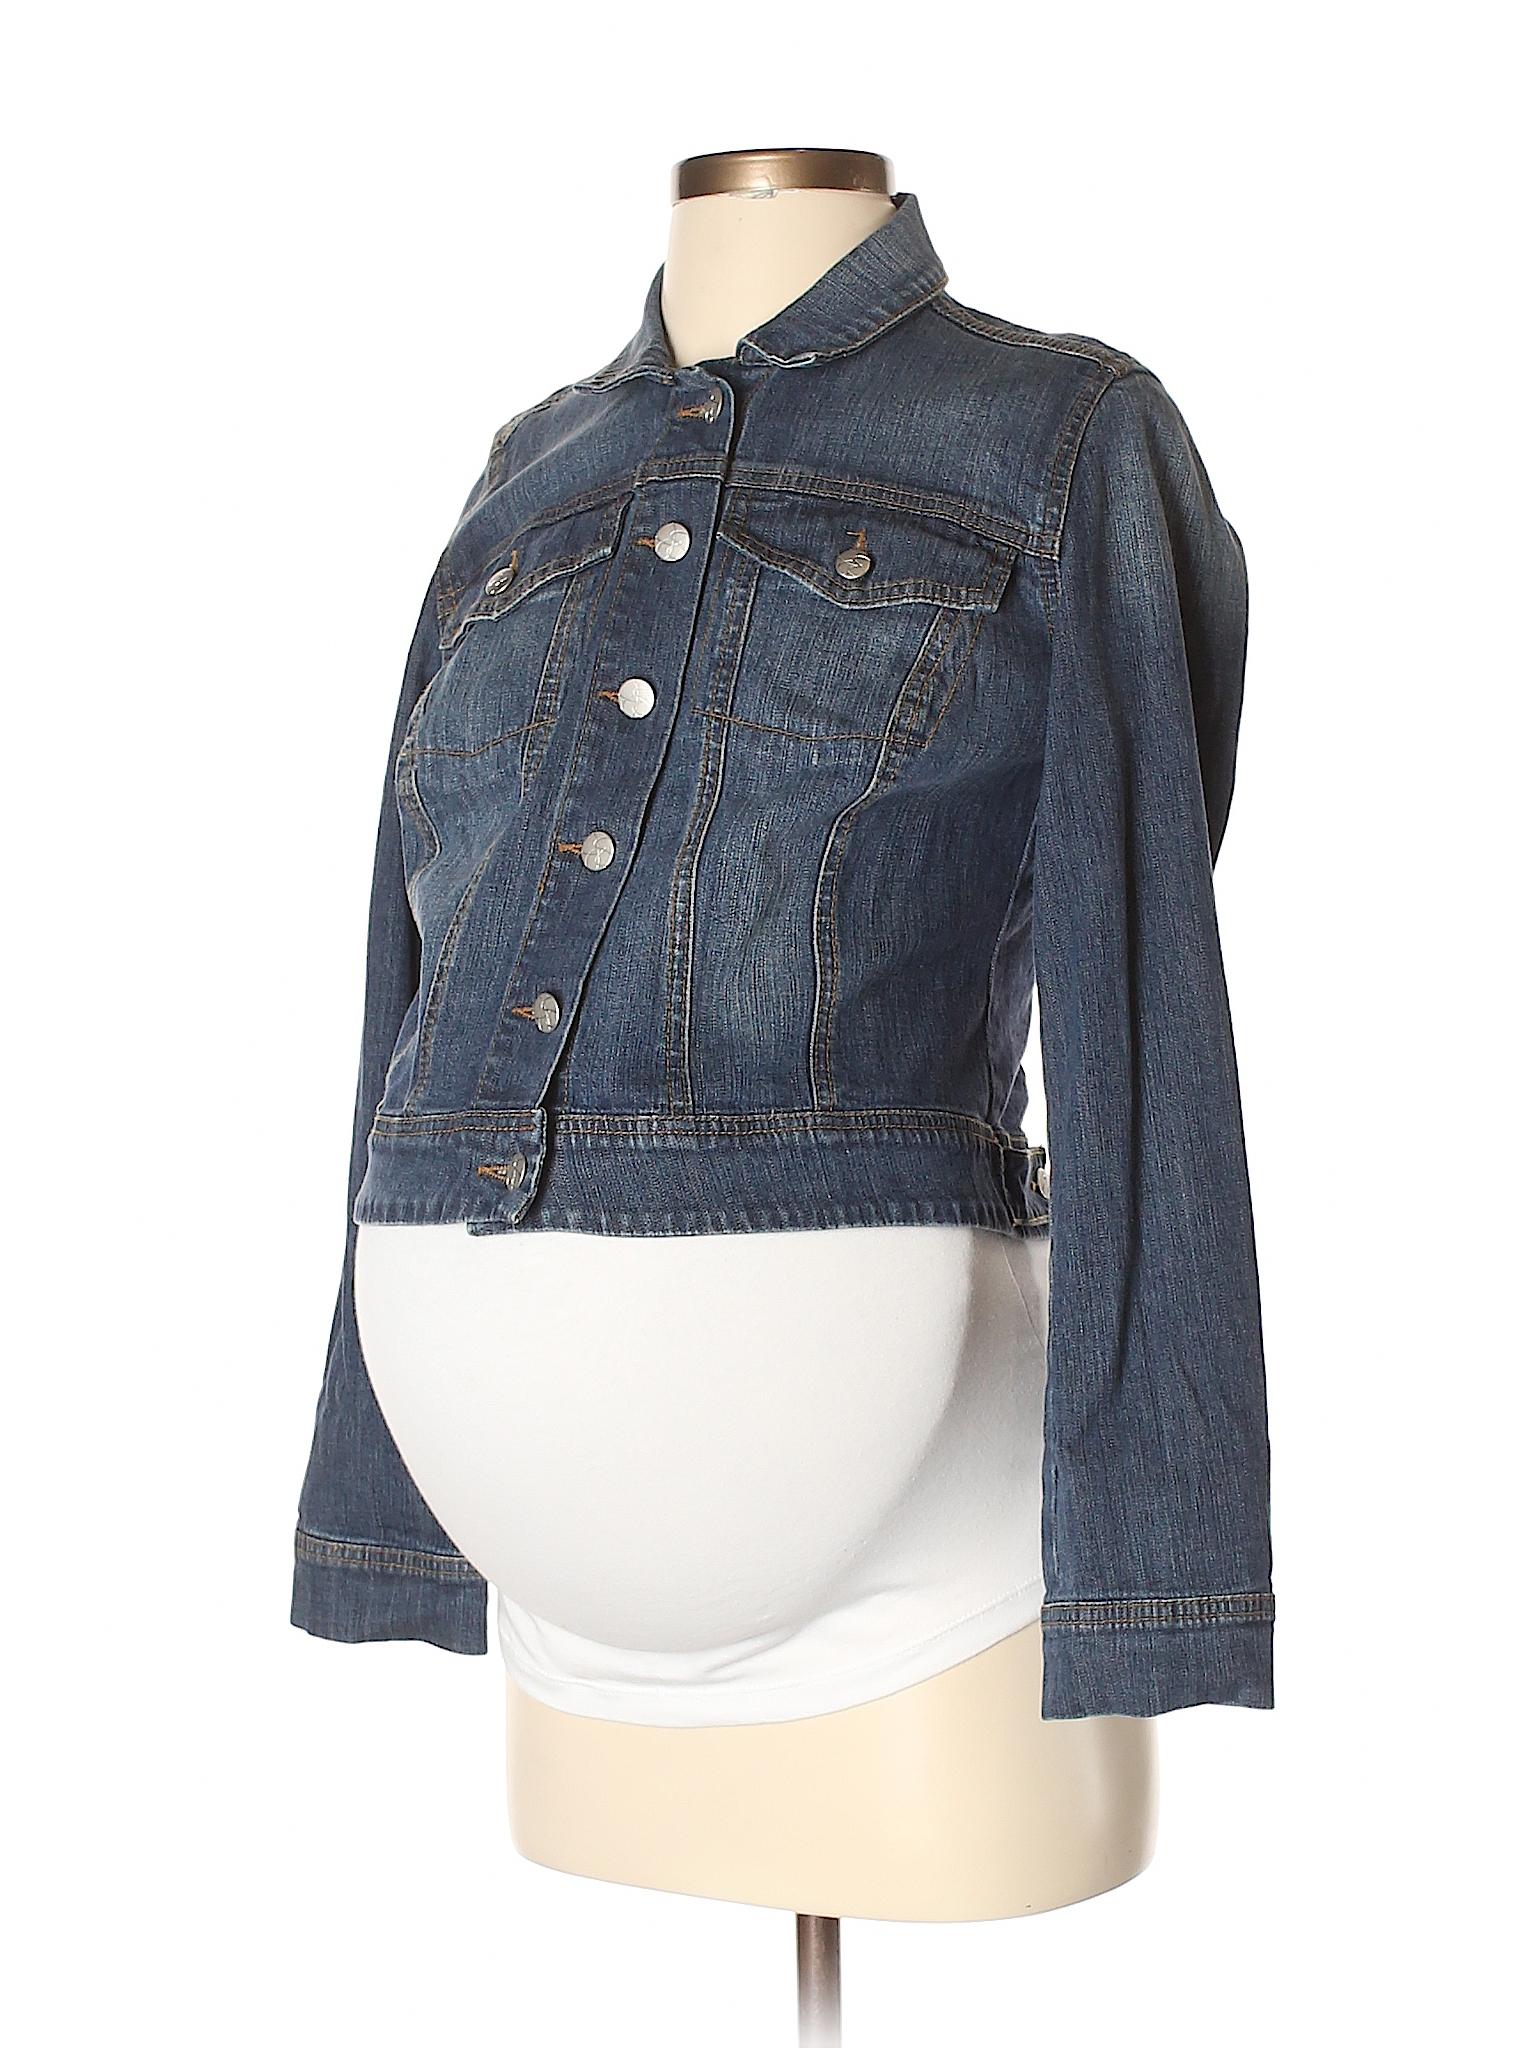 772c2ba1d9e32 Jessica Simpson Maternity Solid Dark Blue Denim Jacket Size S ...